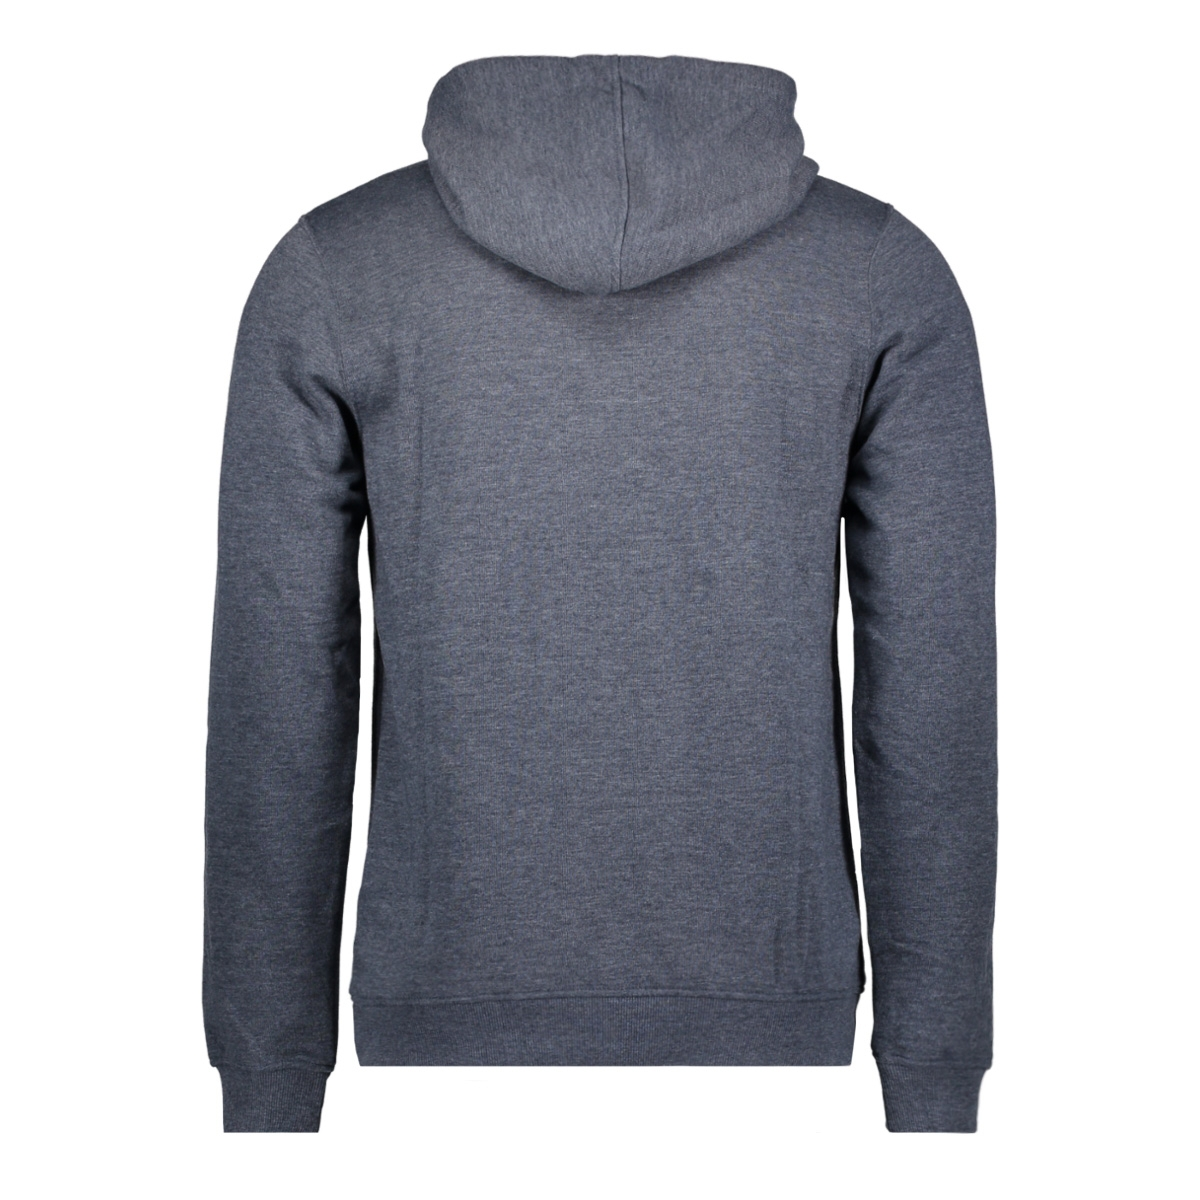 jcolano sweat hood bf 12128568 jack & jones sweater sky captain